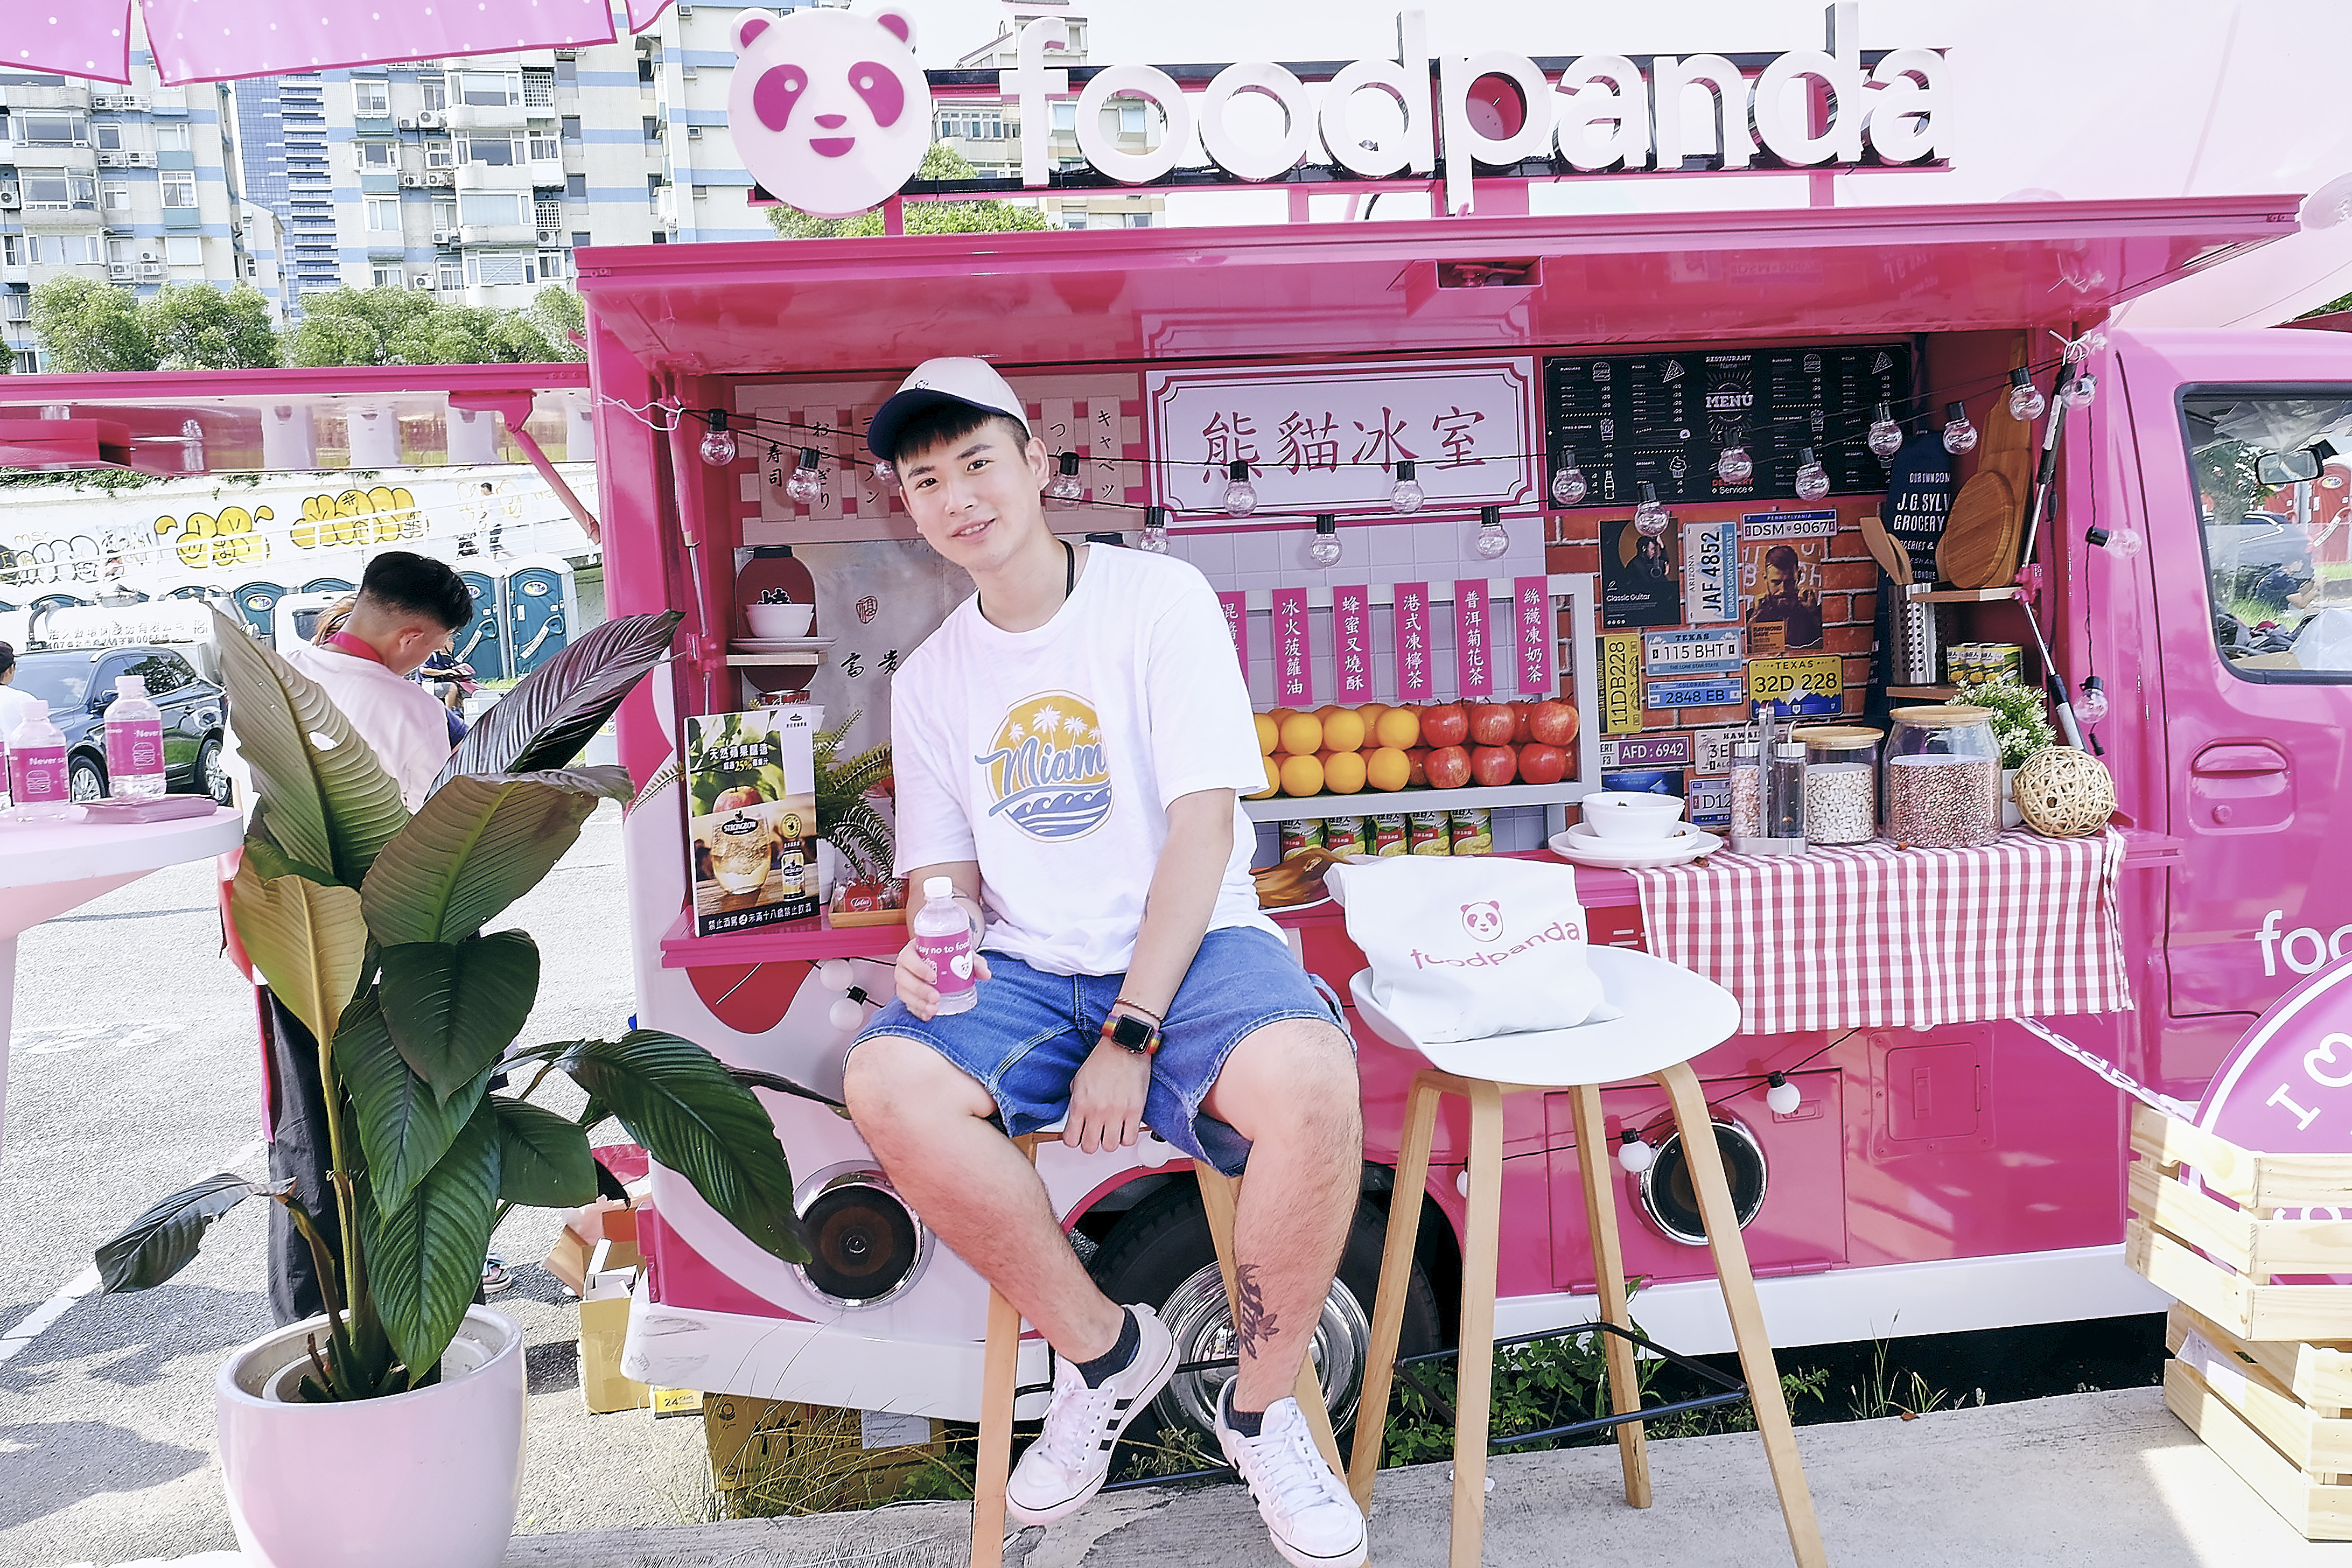 Food Panda 5 - giles.heasman(何家樂) - Taiwan - Vogue Picnic - Sponsor 1